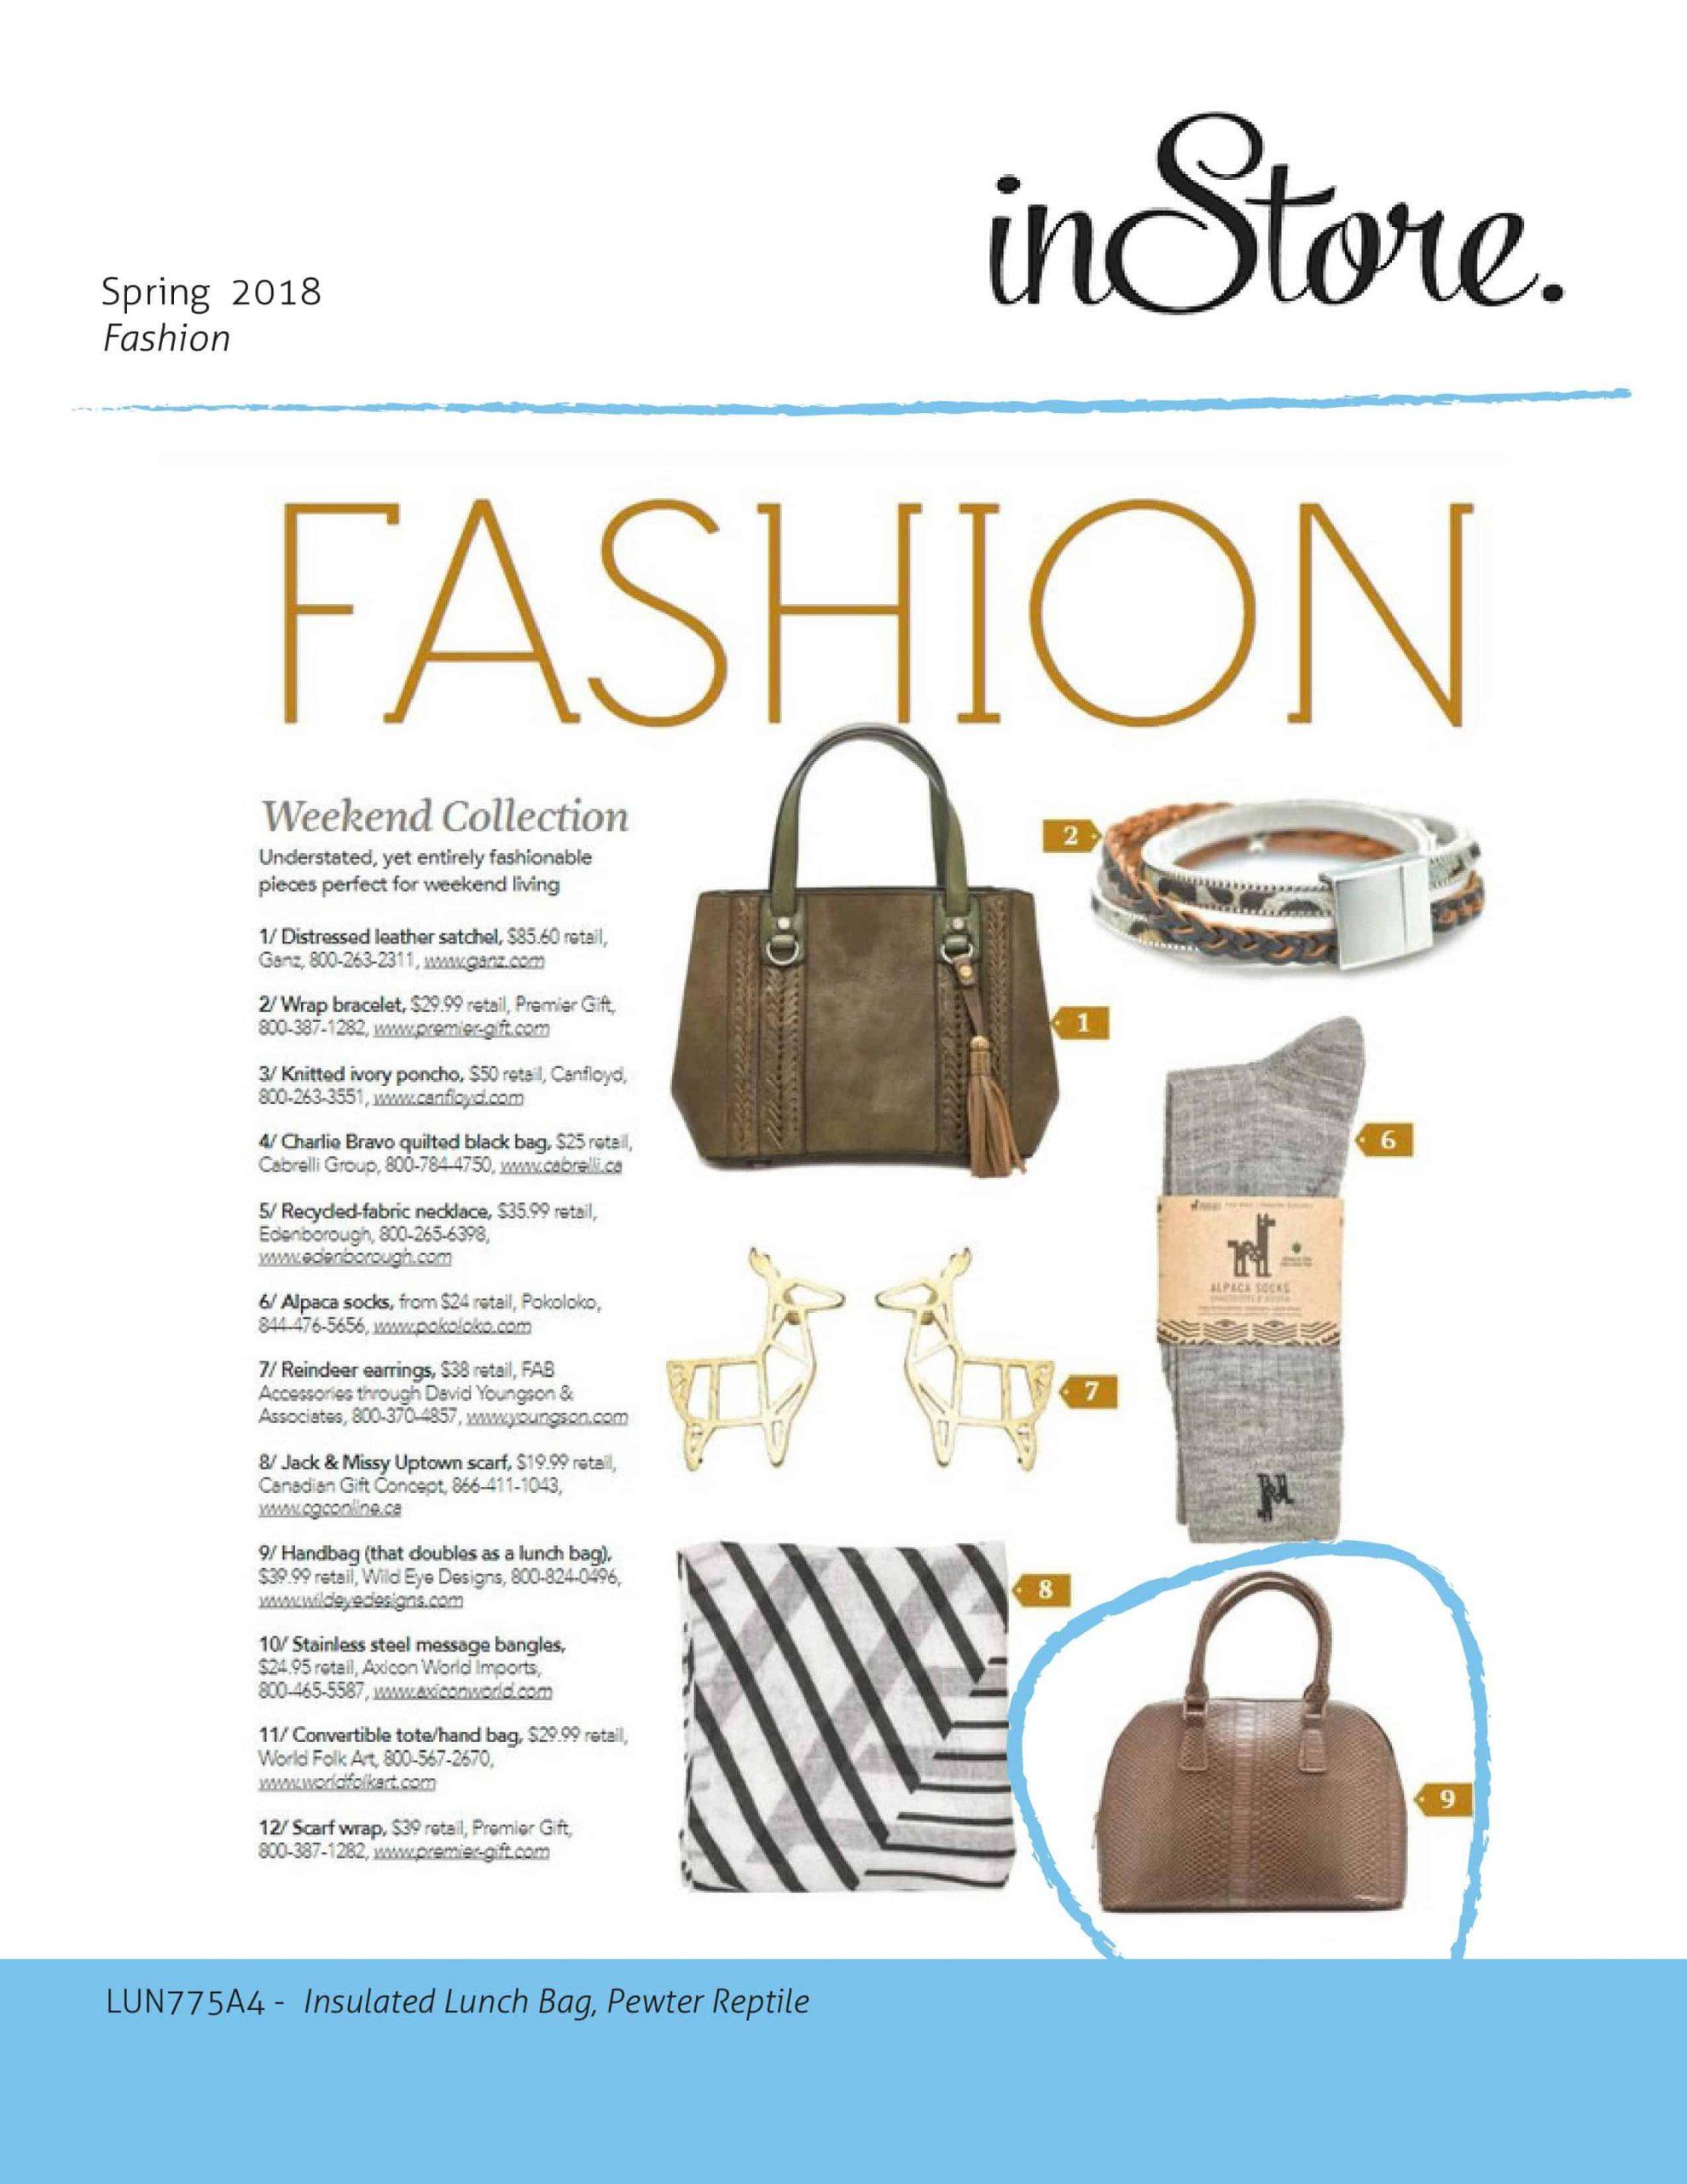 inStore Magazine Spring 2018 Issue